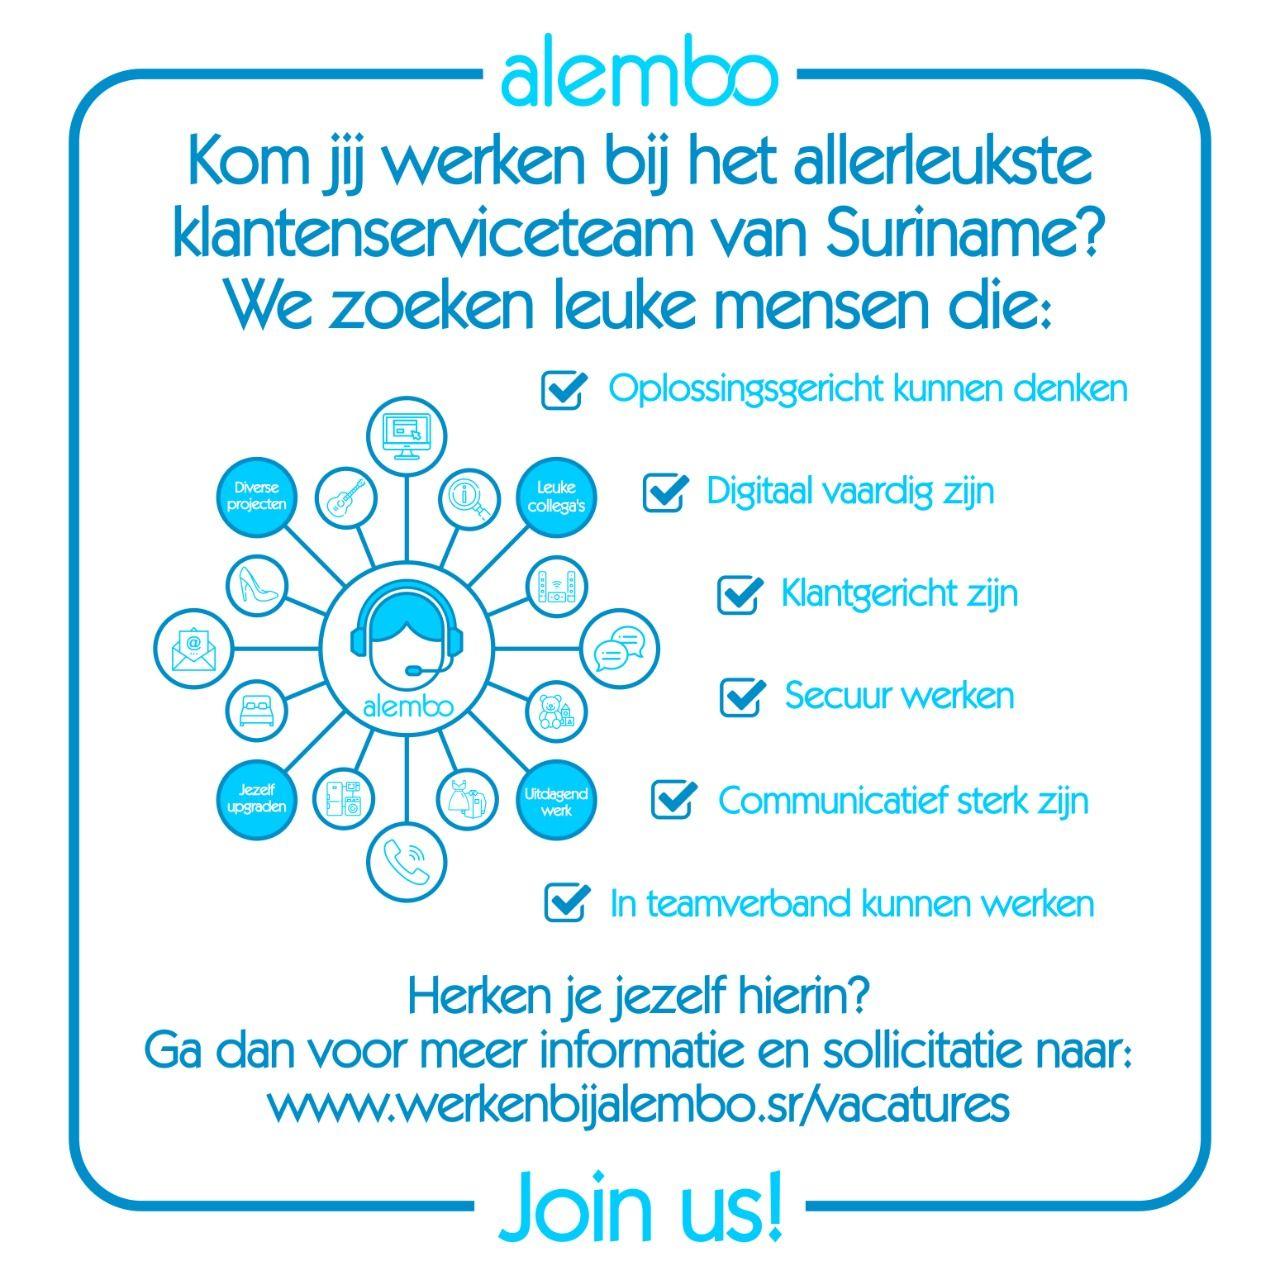 Alembo's klantenservice vacatures